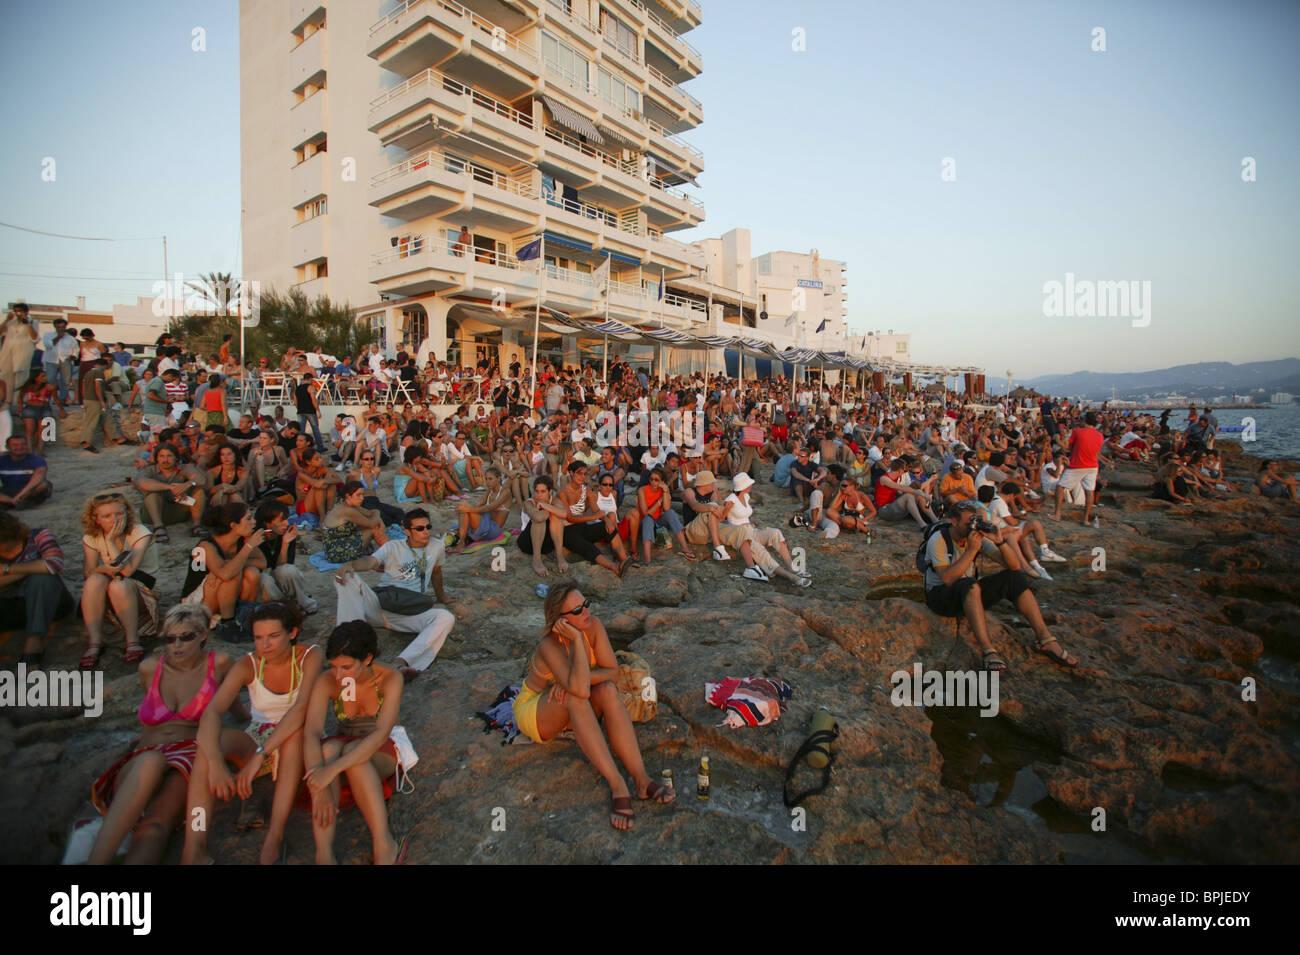 Sunset at Café del Mar Ibiza, Balearic Island, Spain - Stock Image